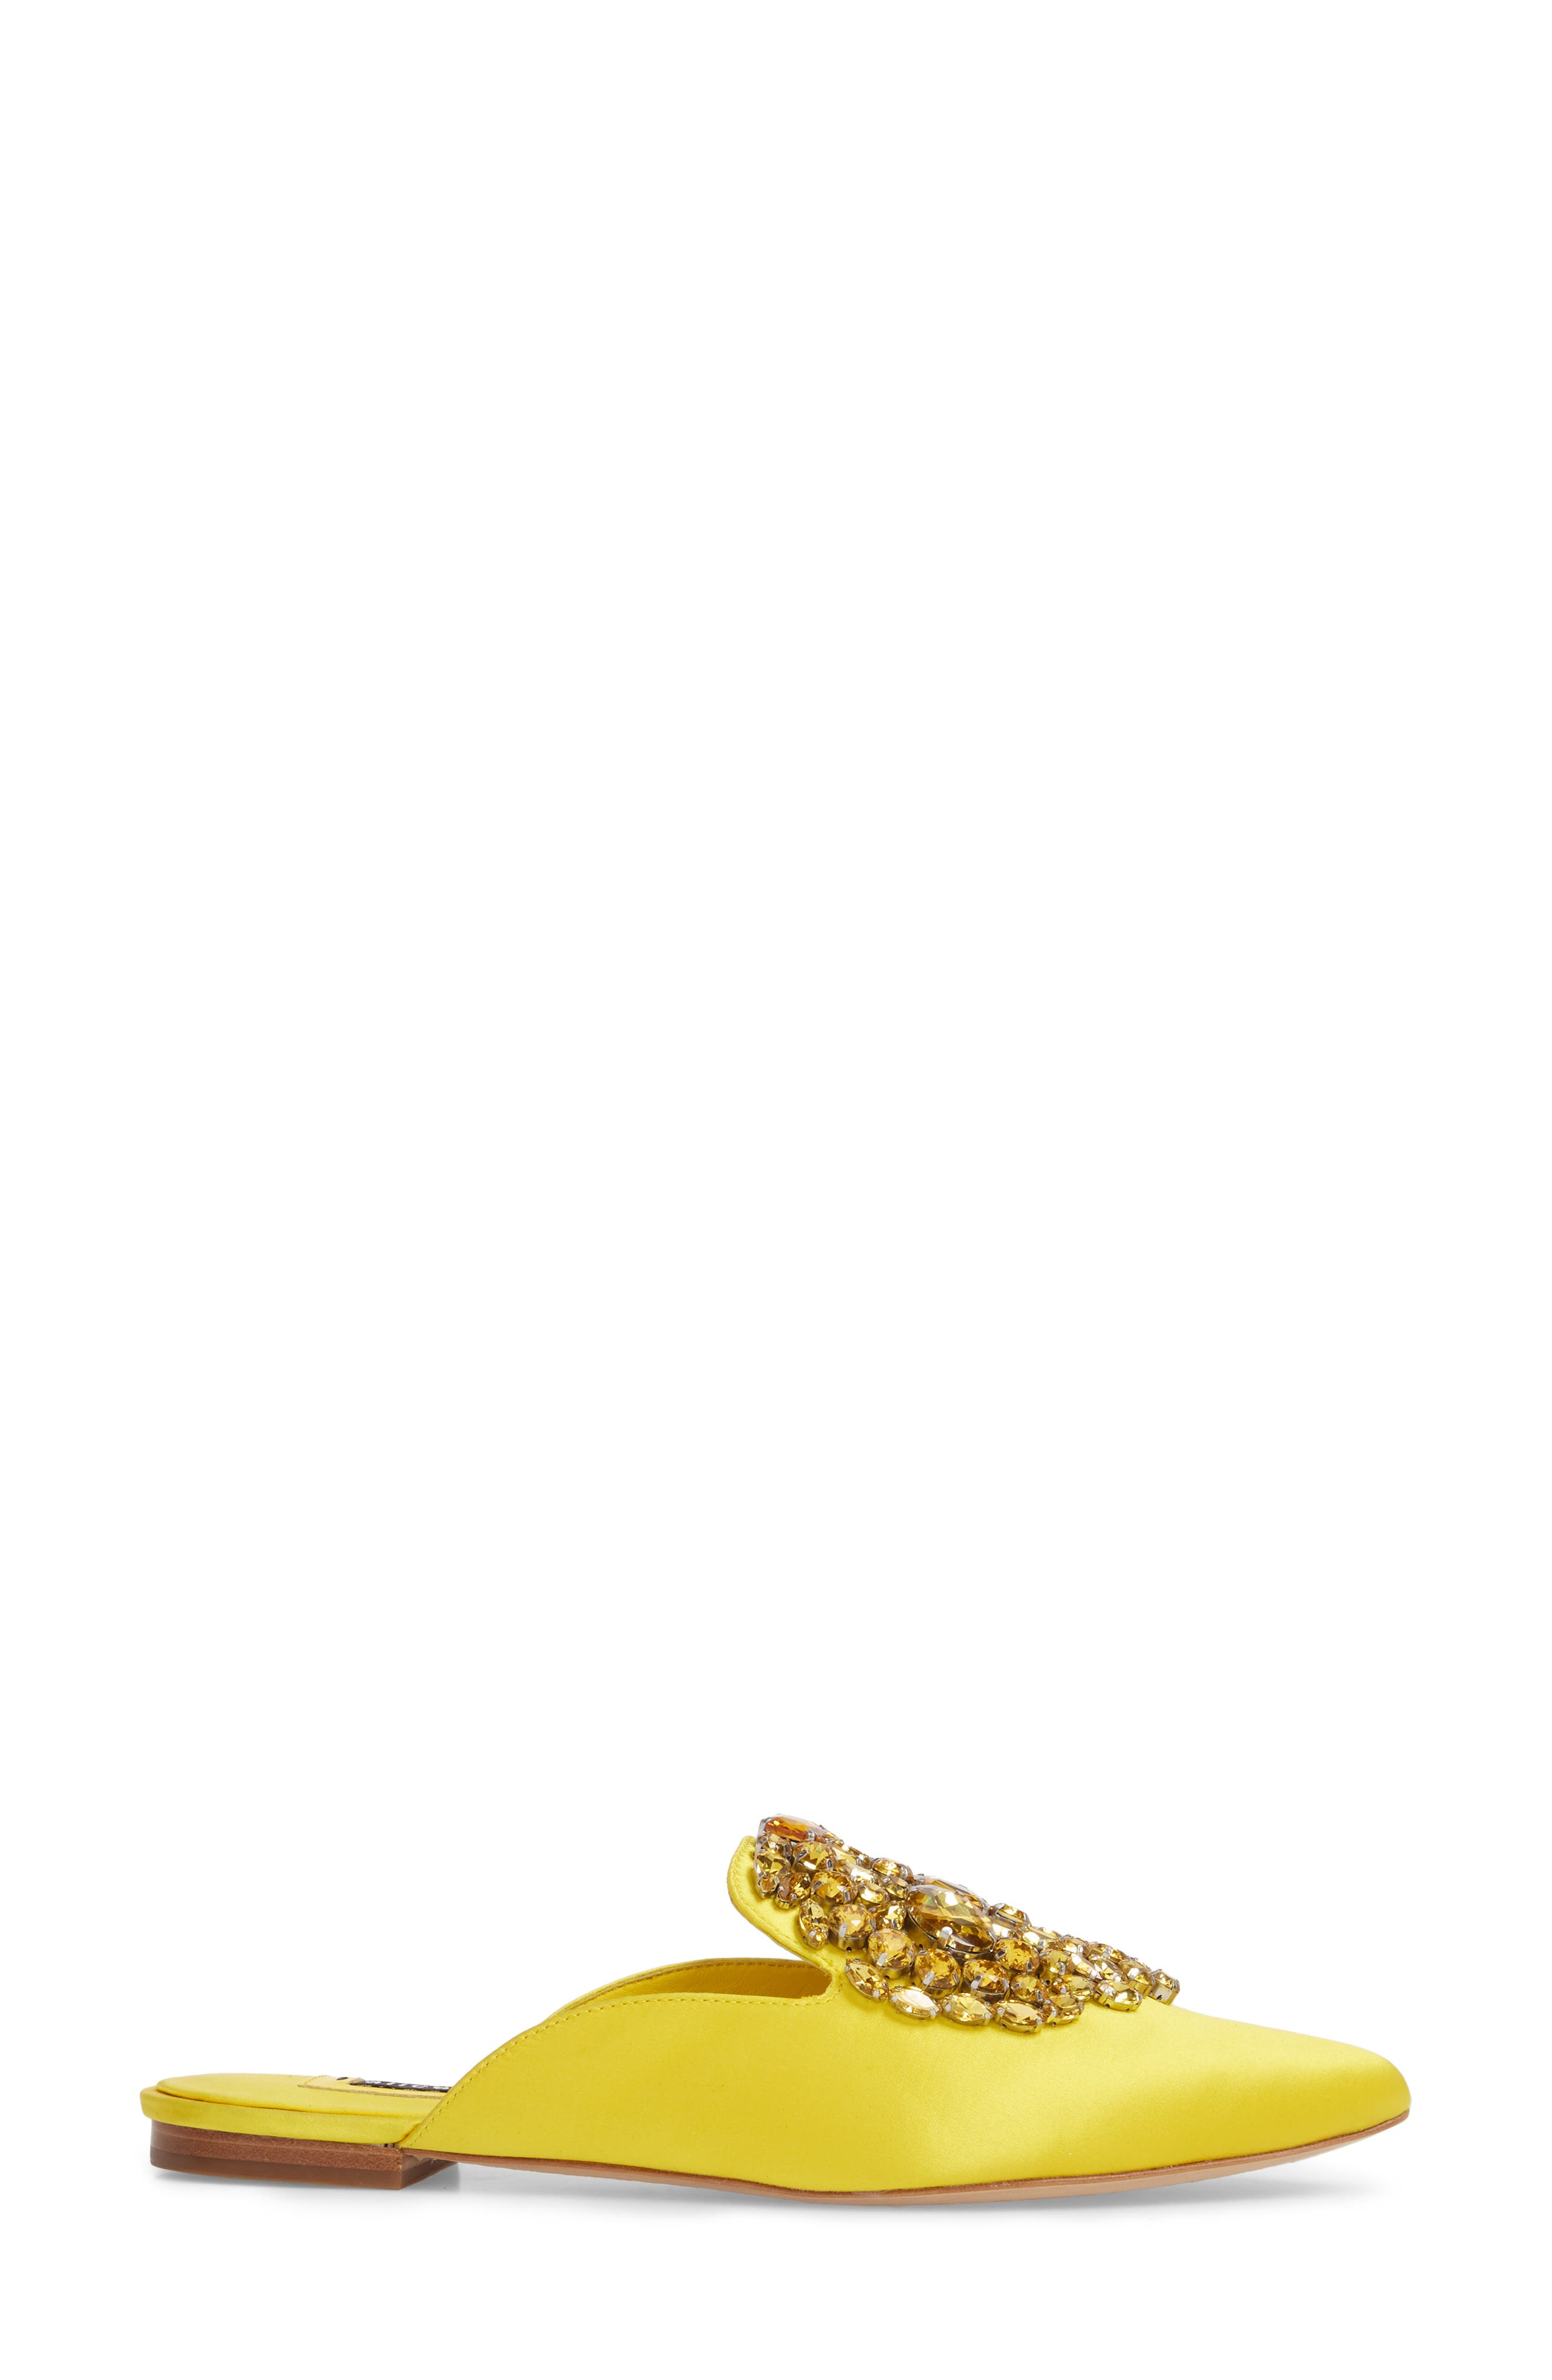 Lilly Crystal Embellished Loafer Mule,                             Alternate thumbnail 6, color,